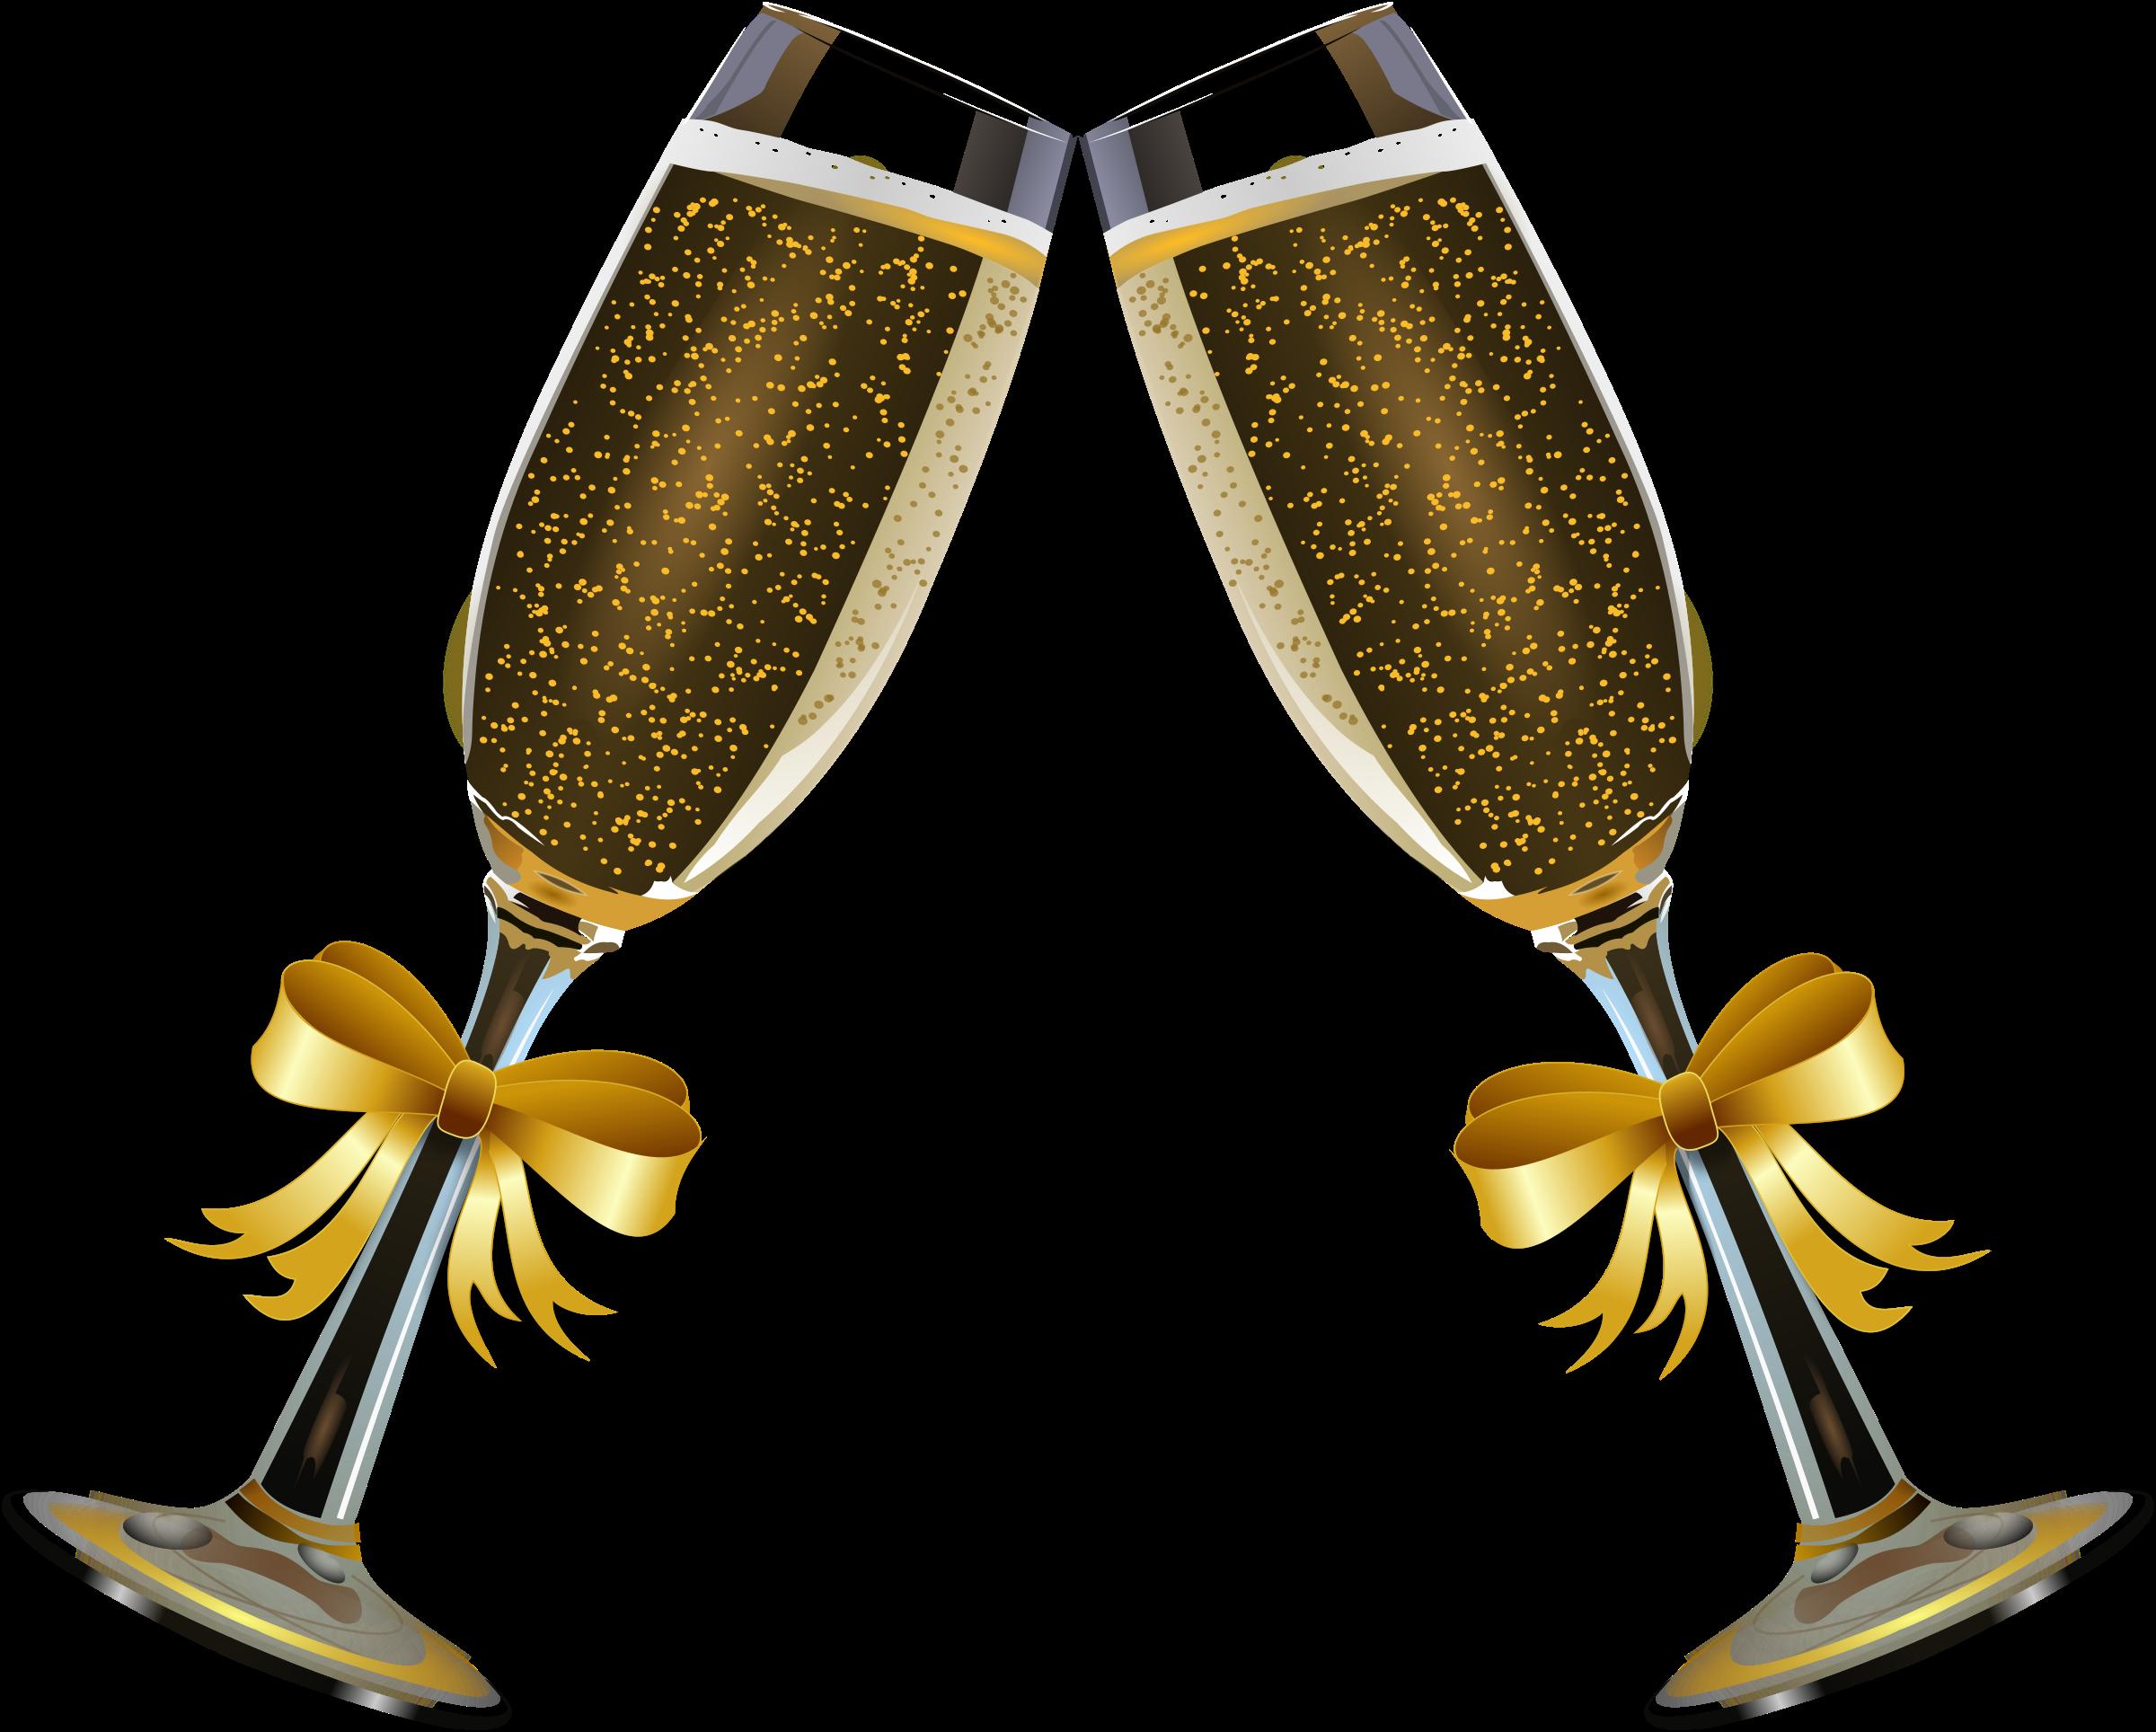 Clipart glasses wedding. Png transparent free images